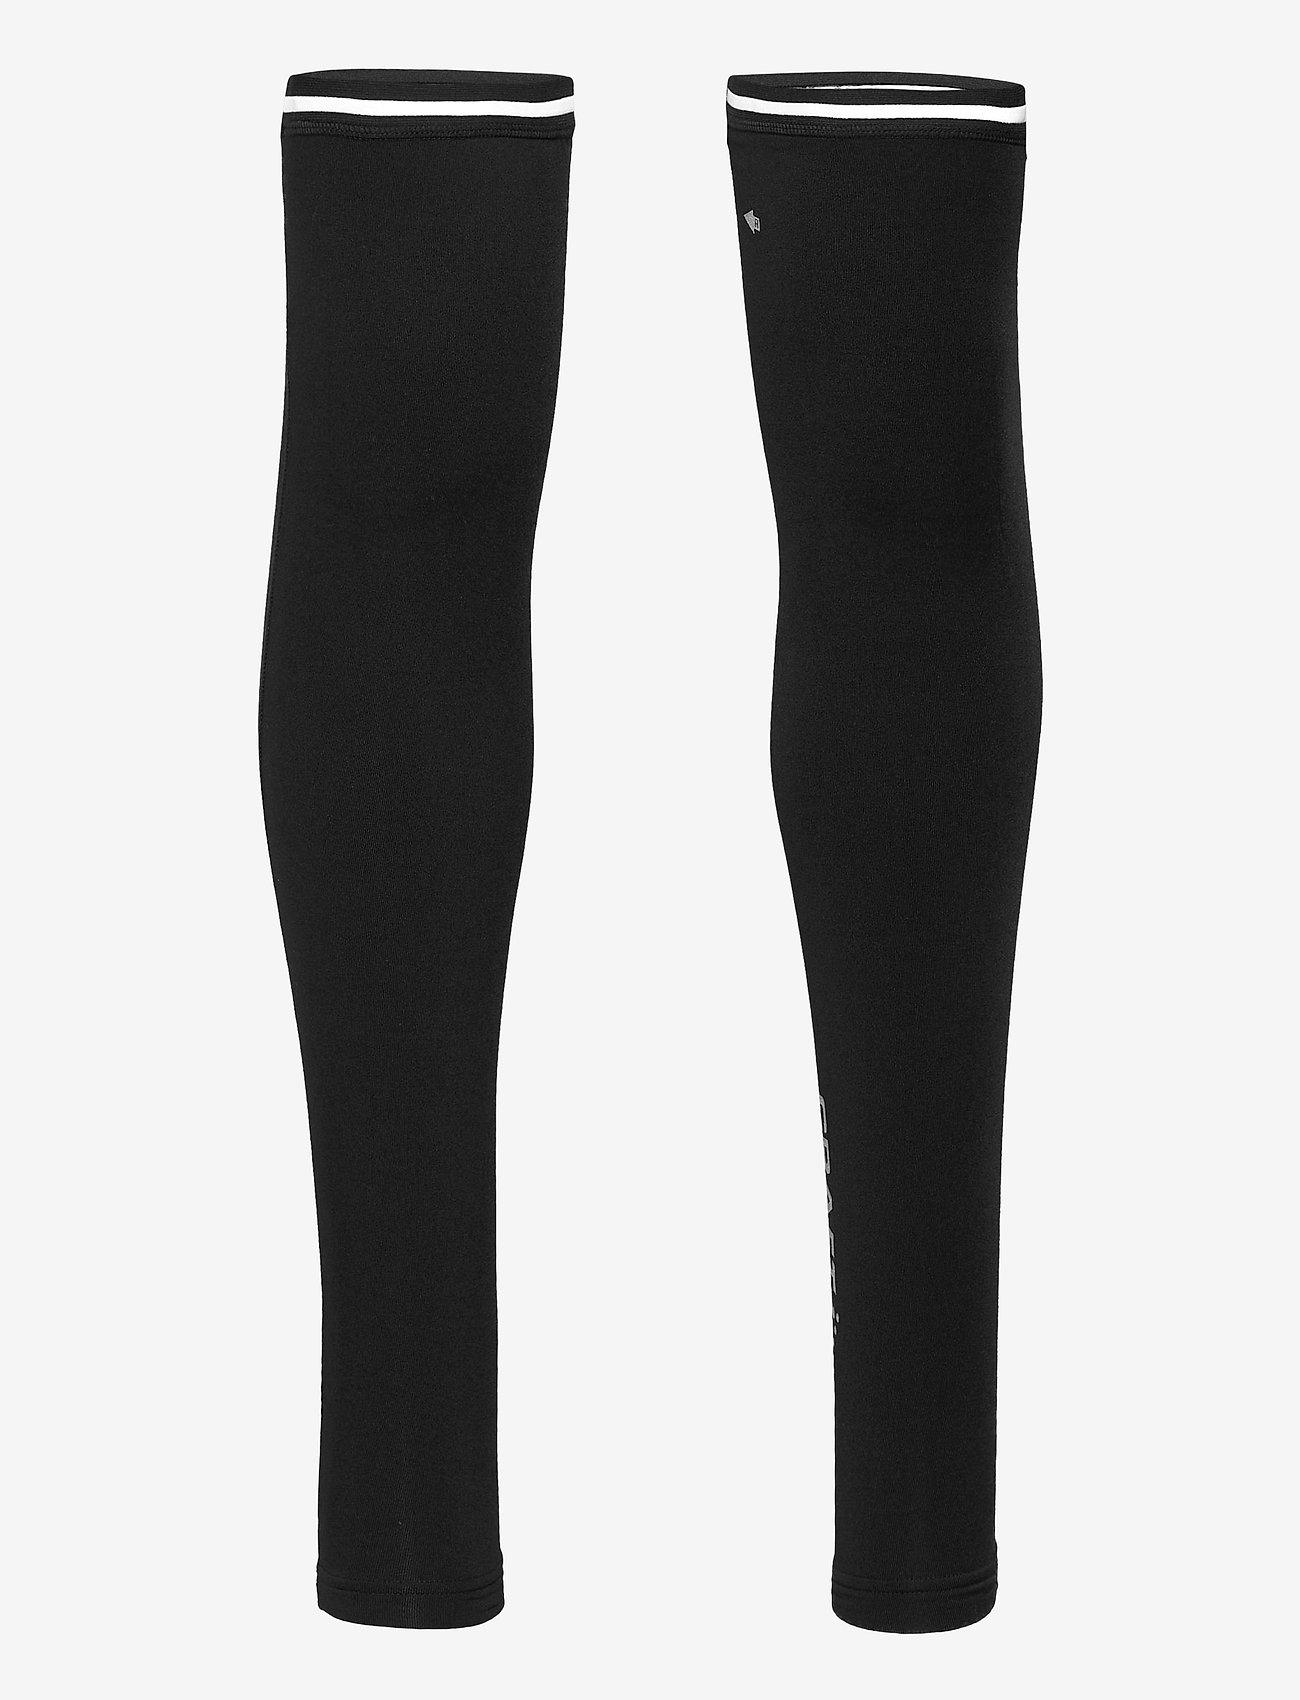 Craft - CRAFT LEG WARMER P GEO BLACK  - citi - black - 0